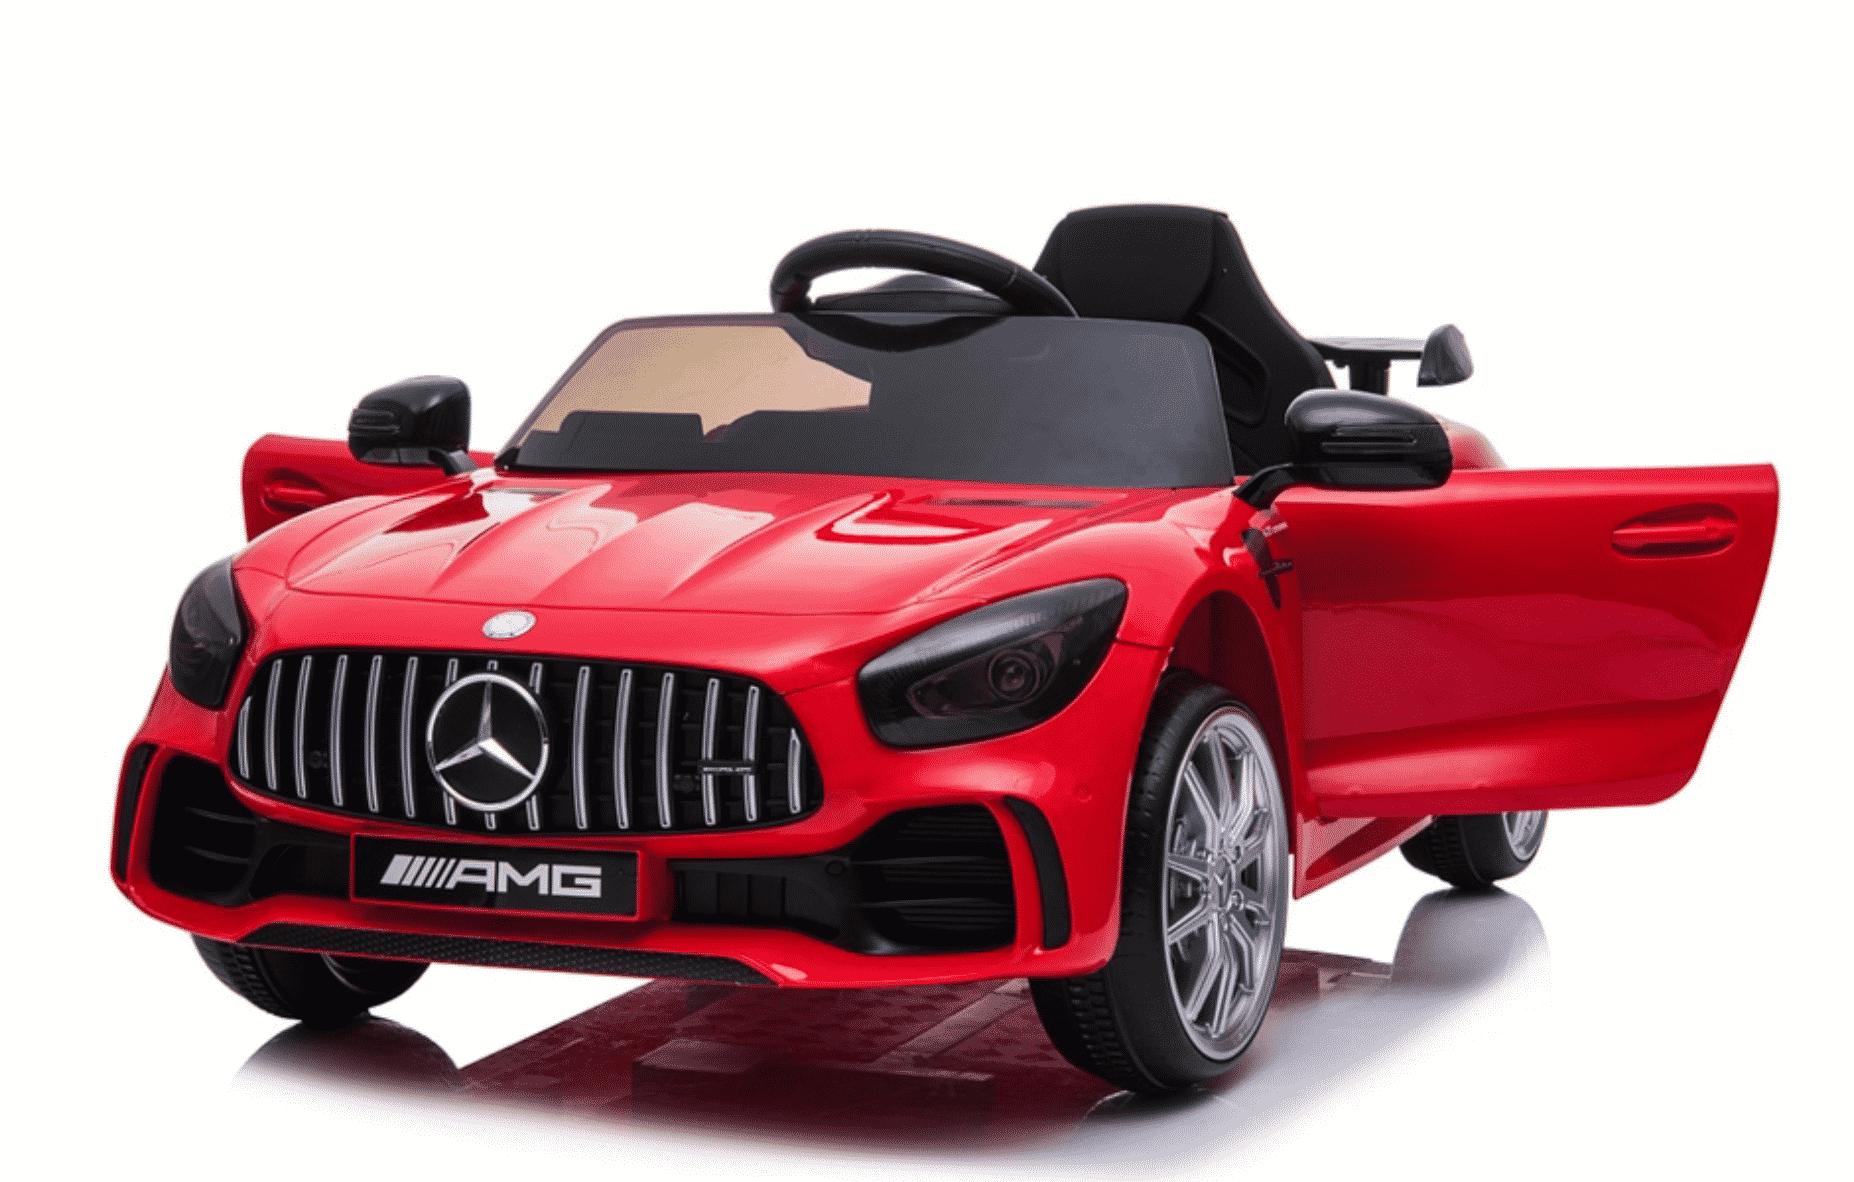 Mercedes GT Biemme – Rosso